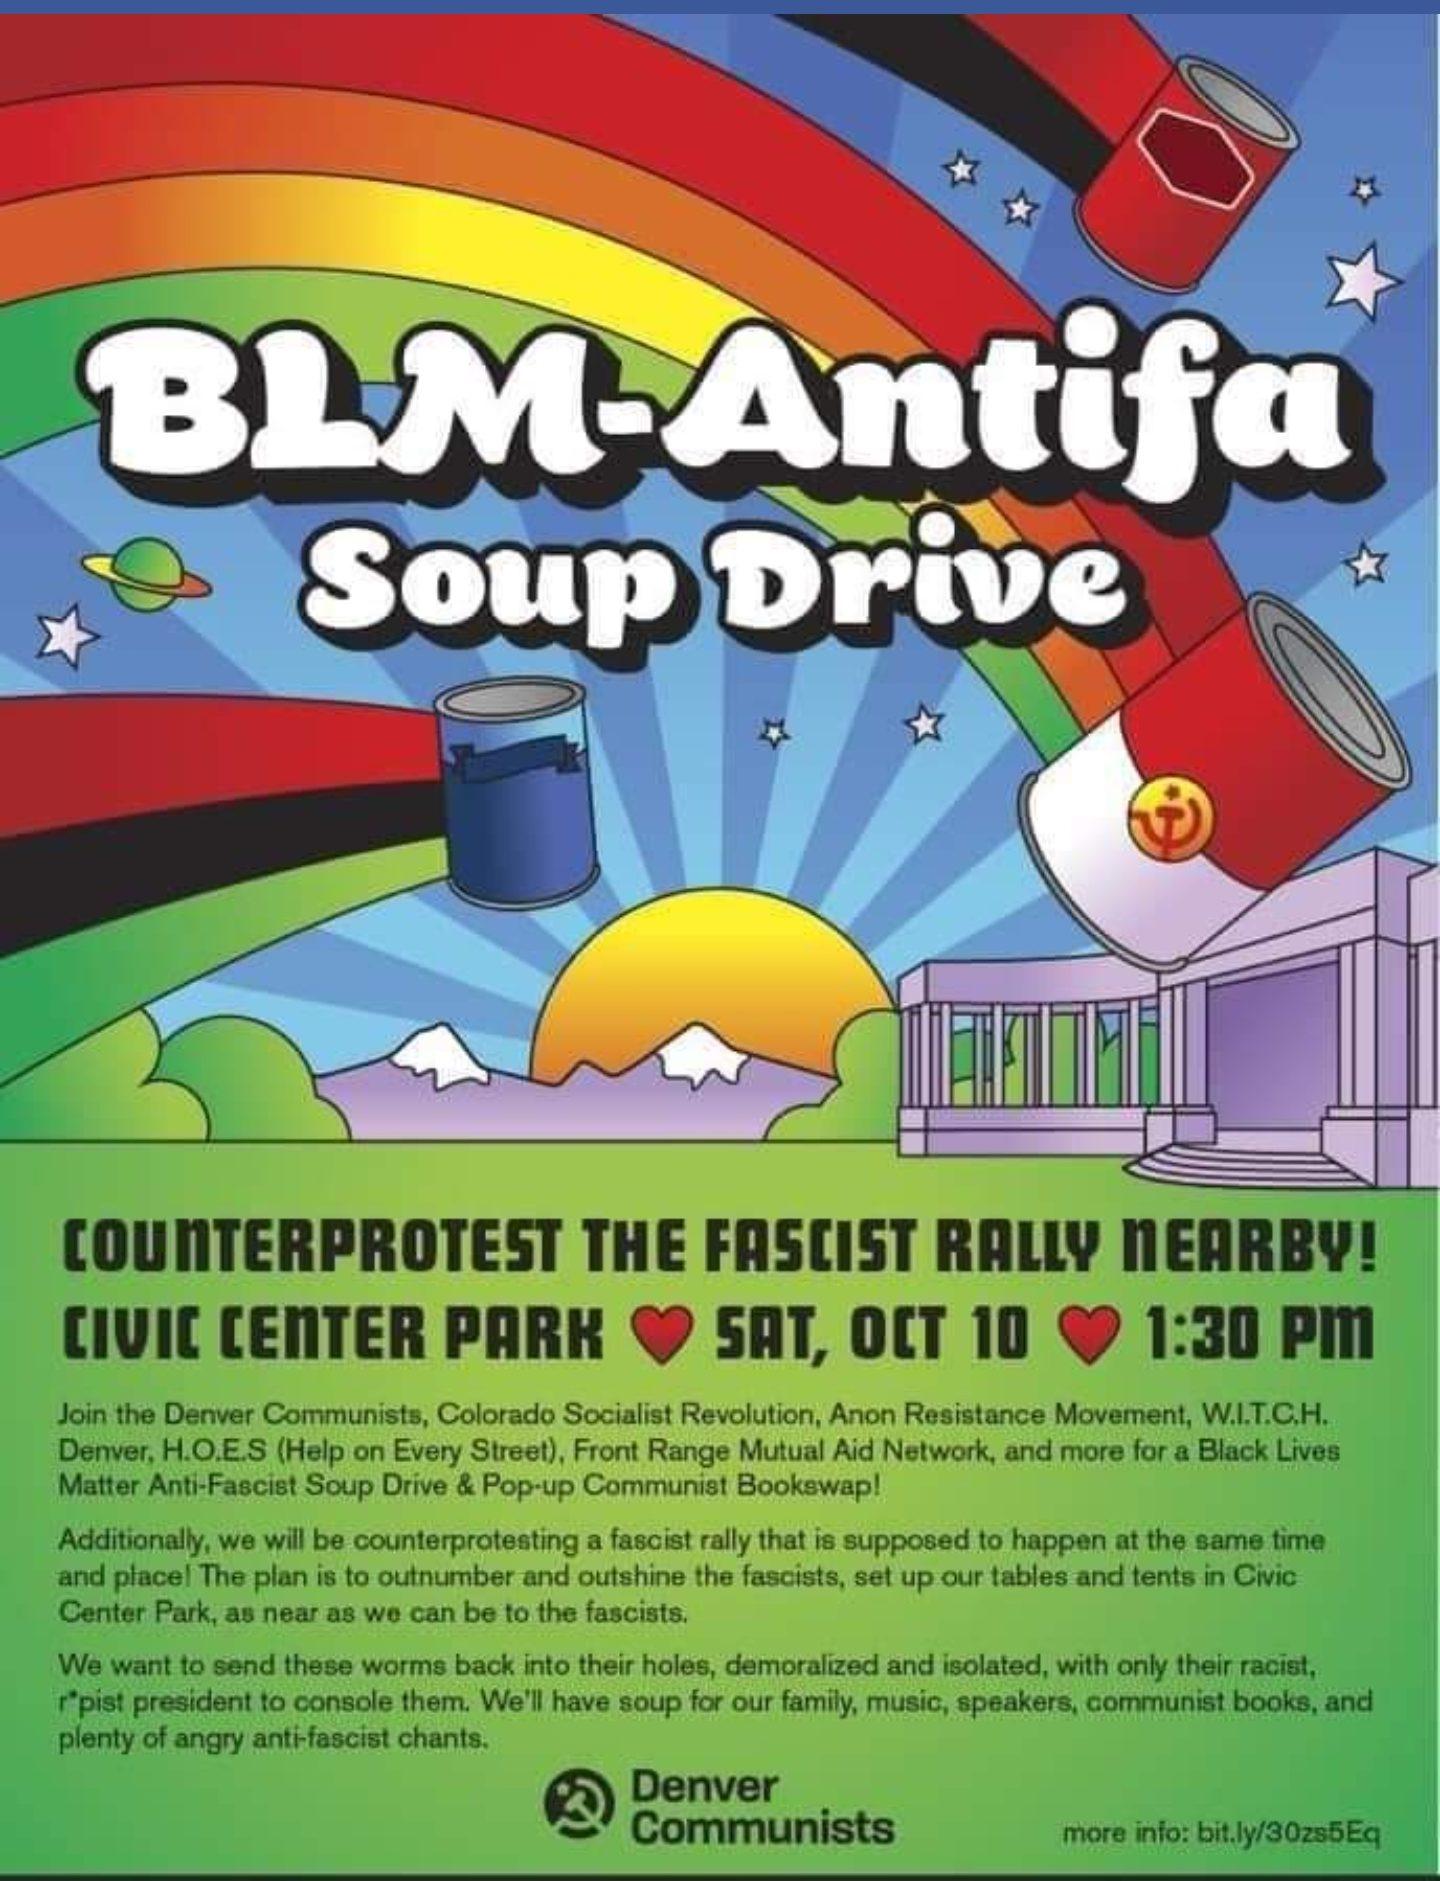 BLM-Antifa Violence